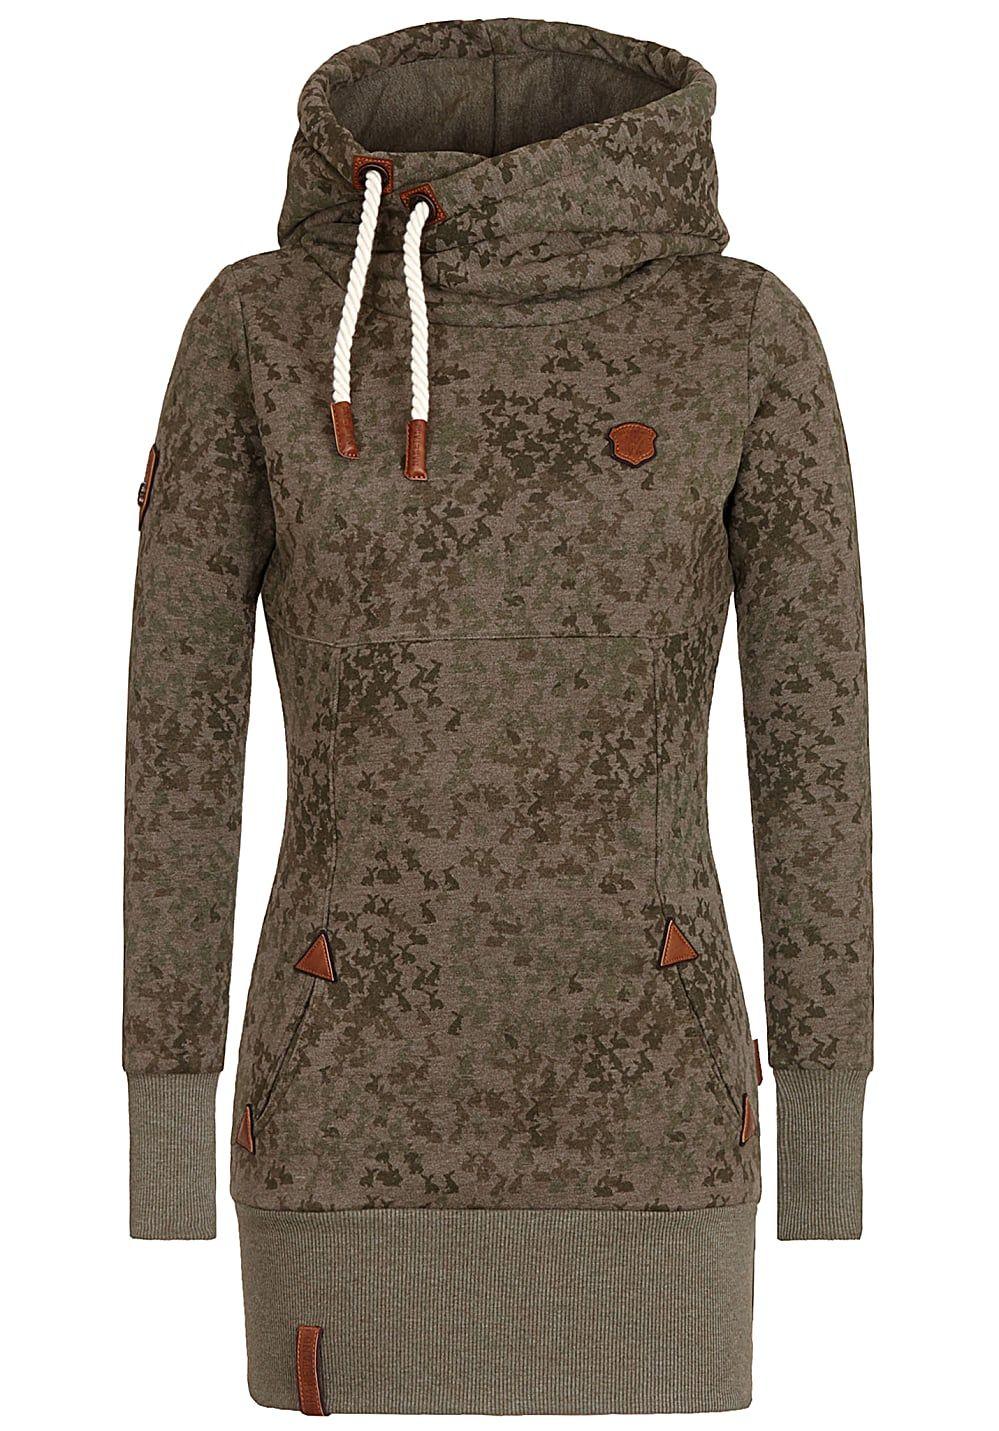 c4744c493b Naketano Lange Hase Kapuzenpullover für Damen #pullover #fashion #damenmode